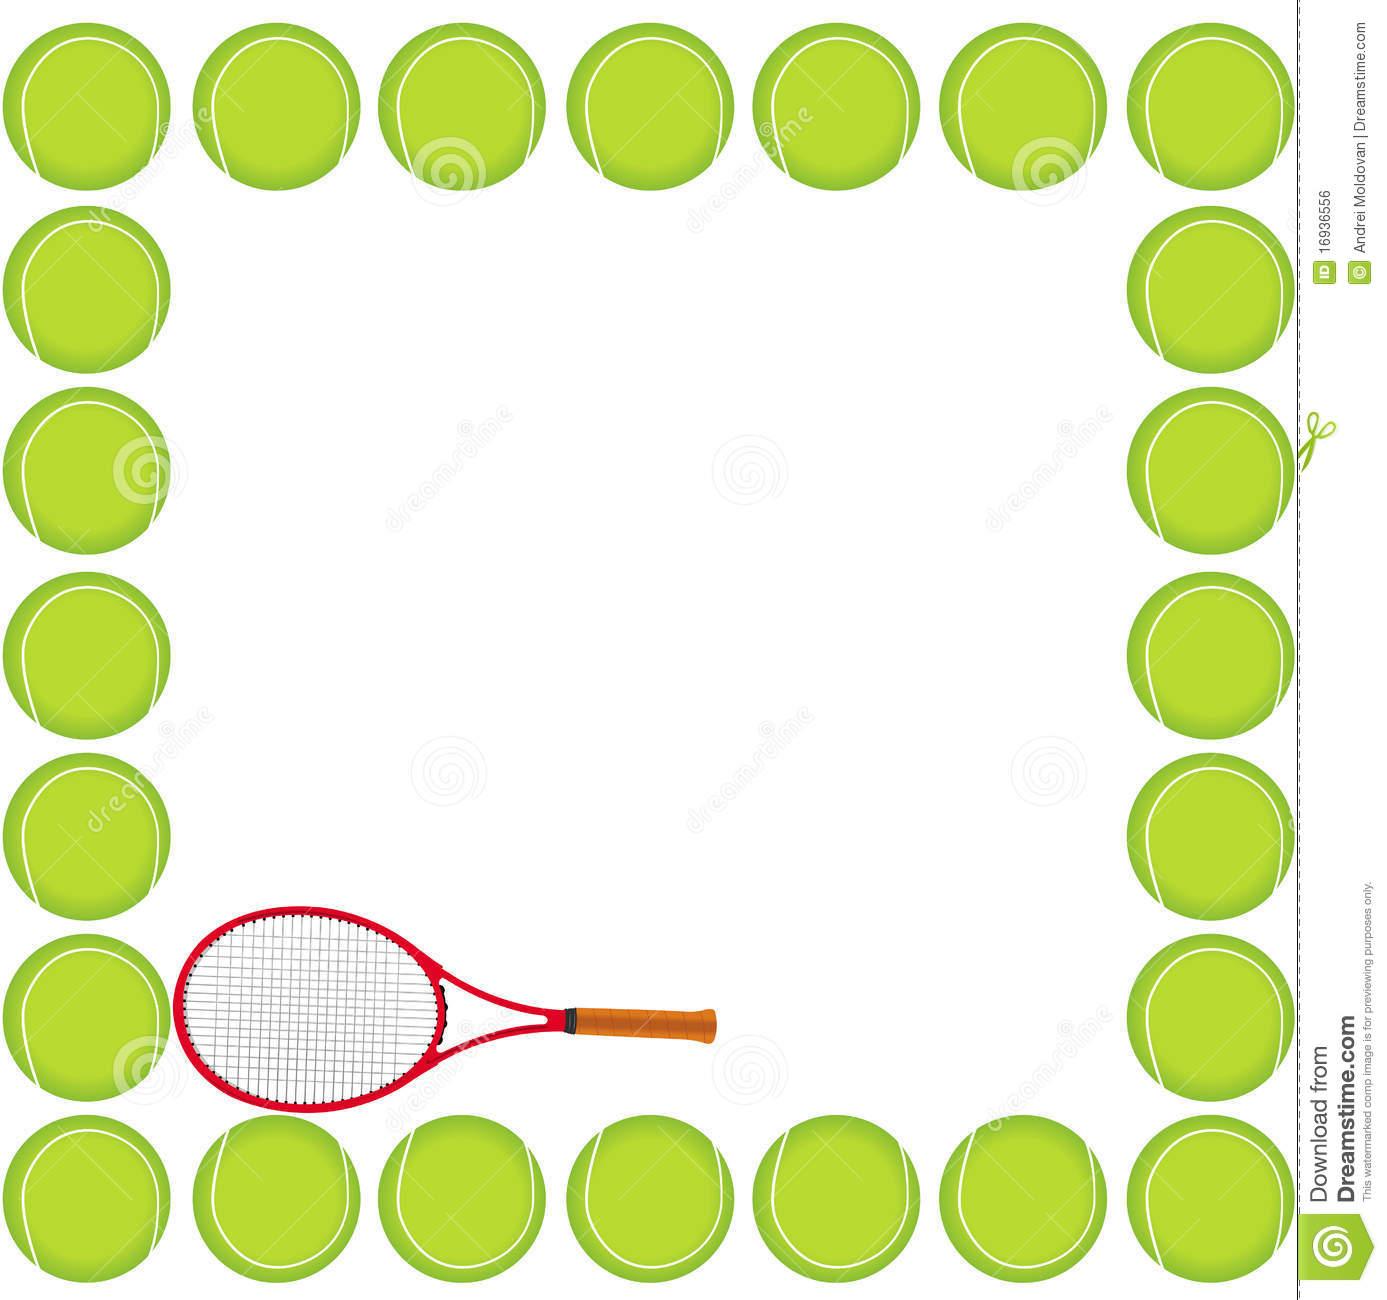 clipart panda tennis - photo #42